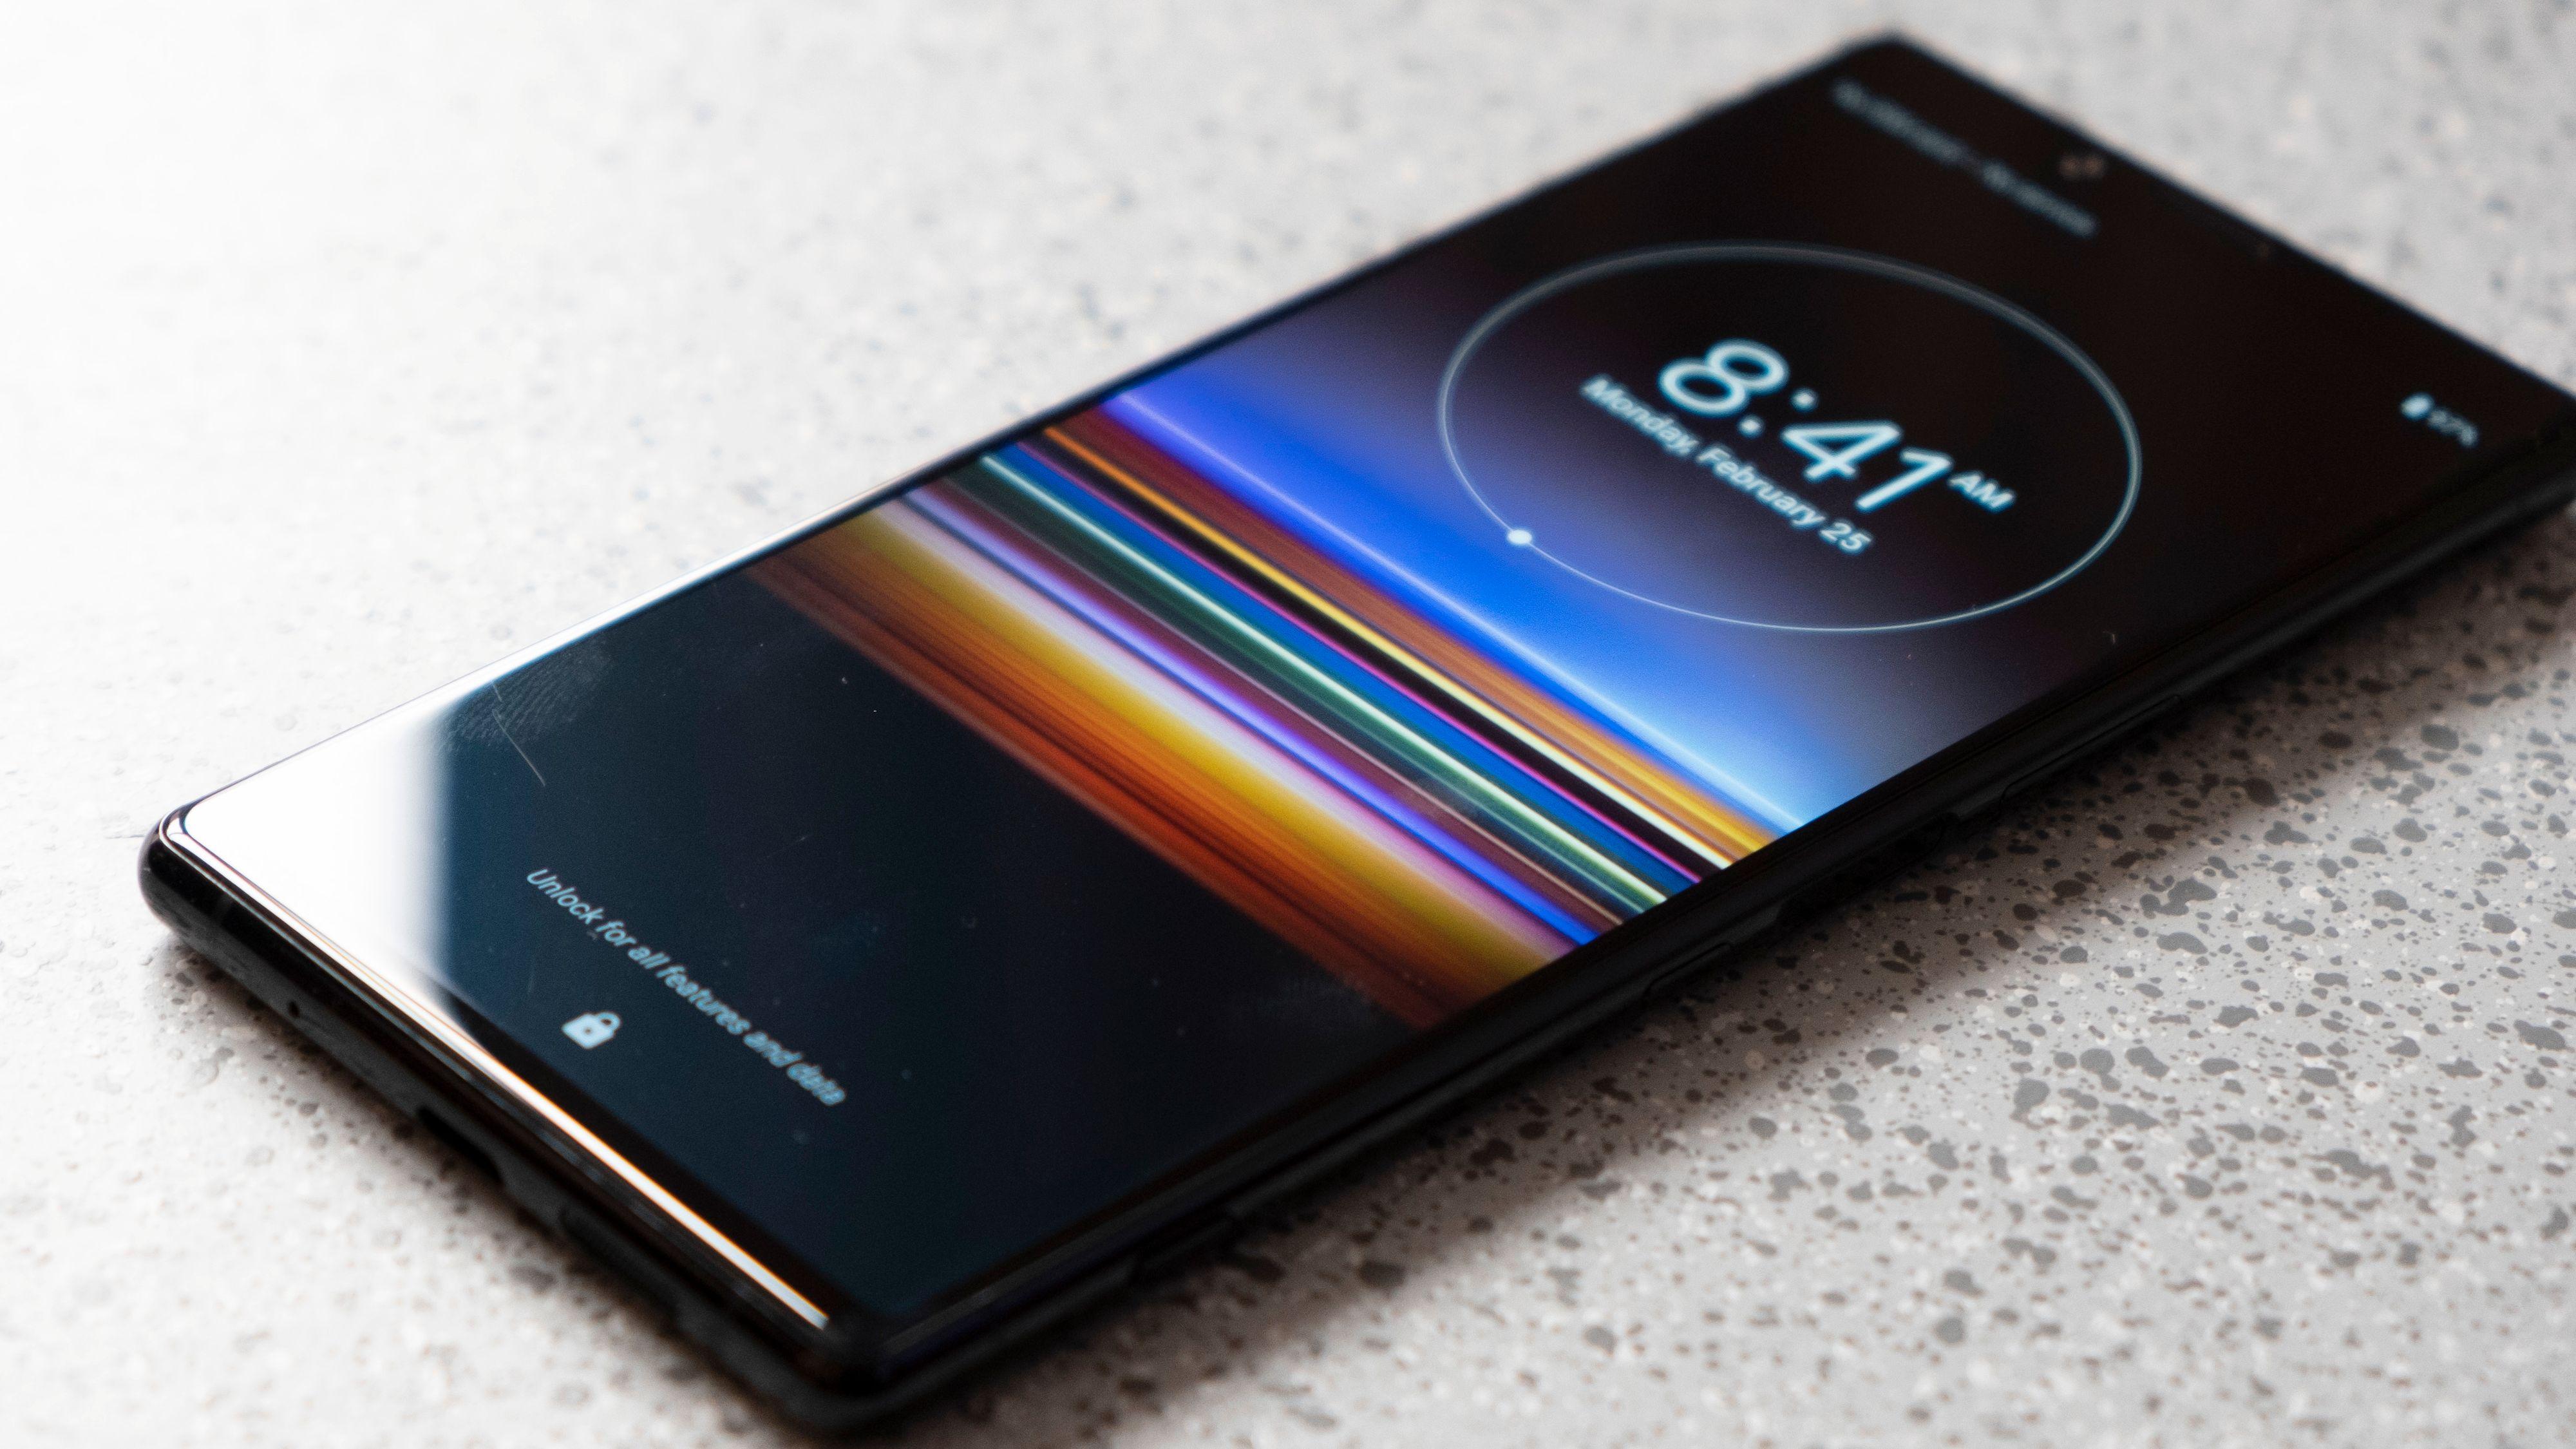 Ny rimelig og ekstra lang mobil fra Sony | Komputer.no